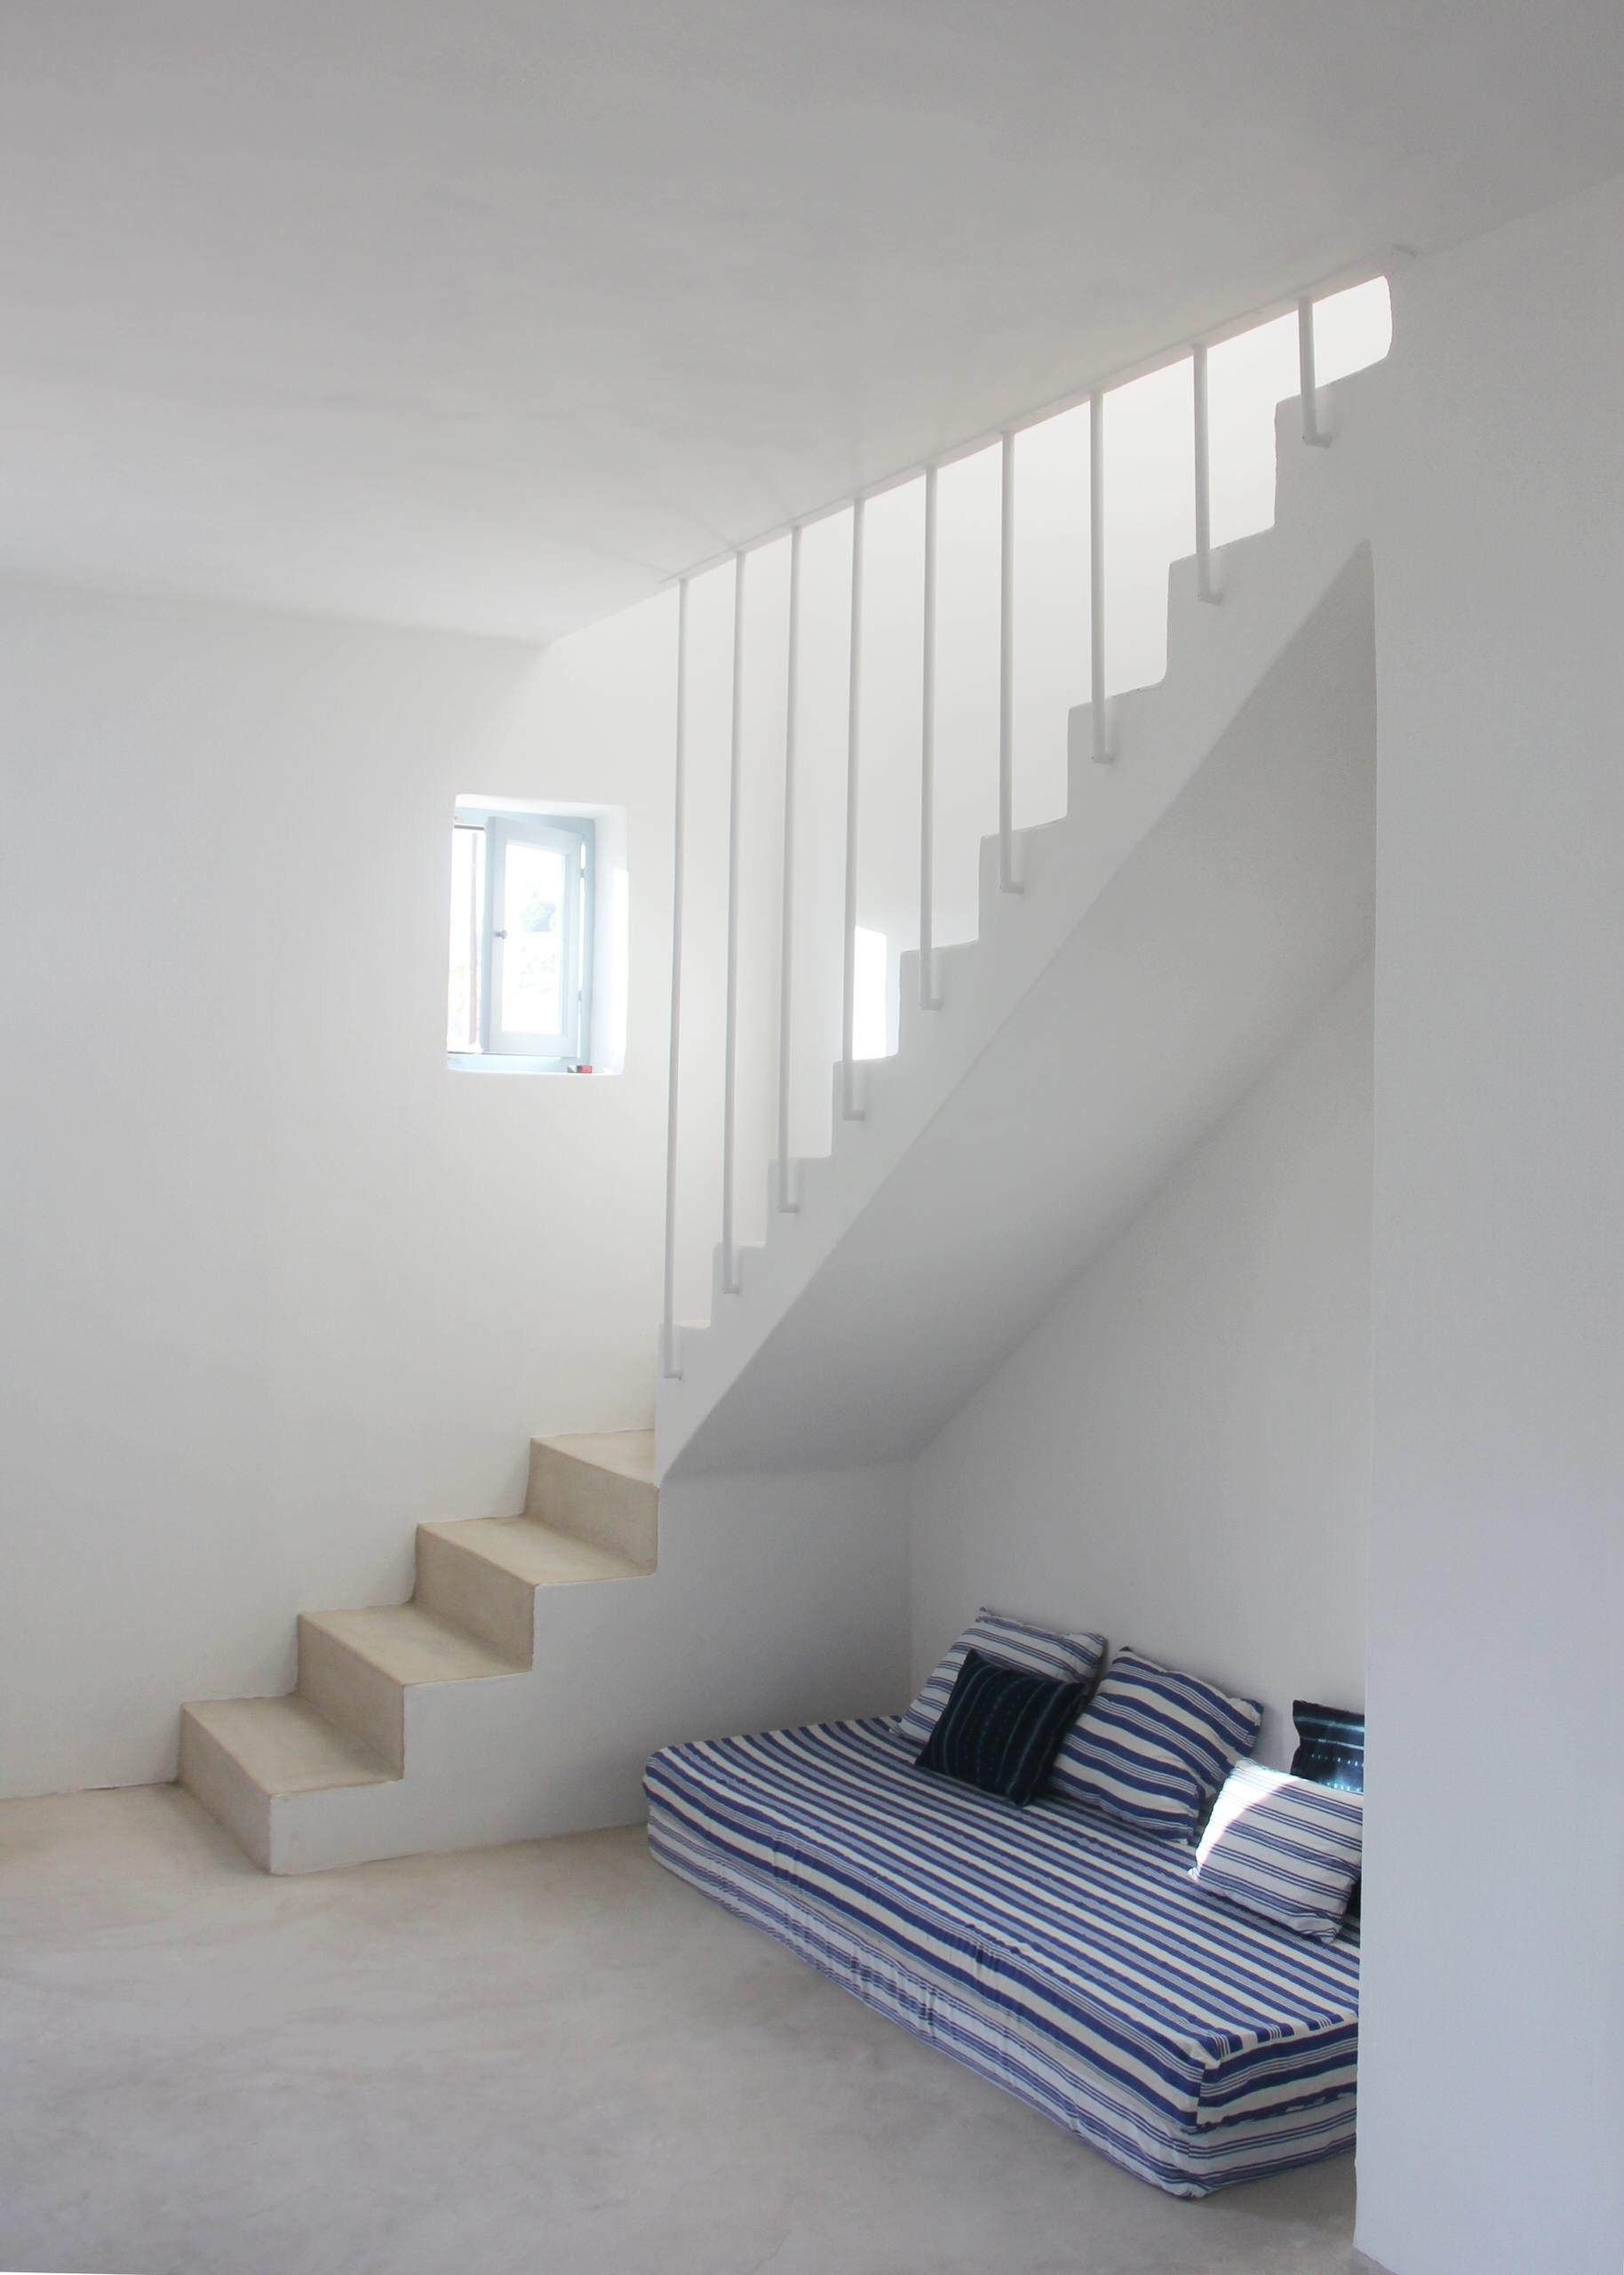 75 Beautiful Concrete Staircase Pictures Ideas September 2020   Interior Concrete Stairs Design   Architecture   House   White Matte Concrete   Urban   Dark Wood Modern